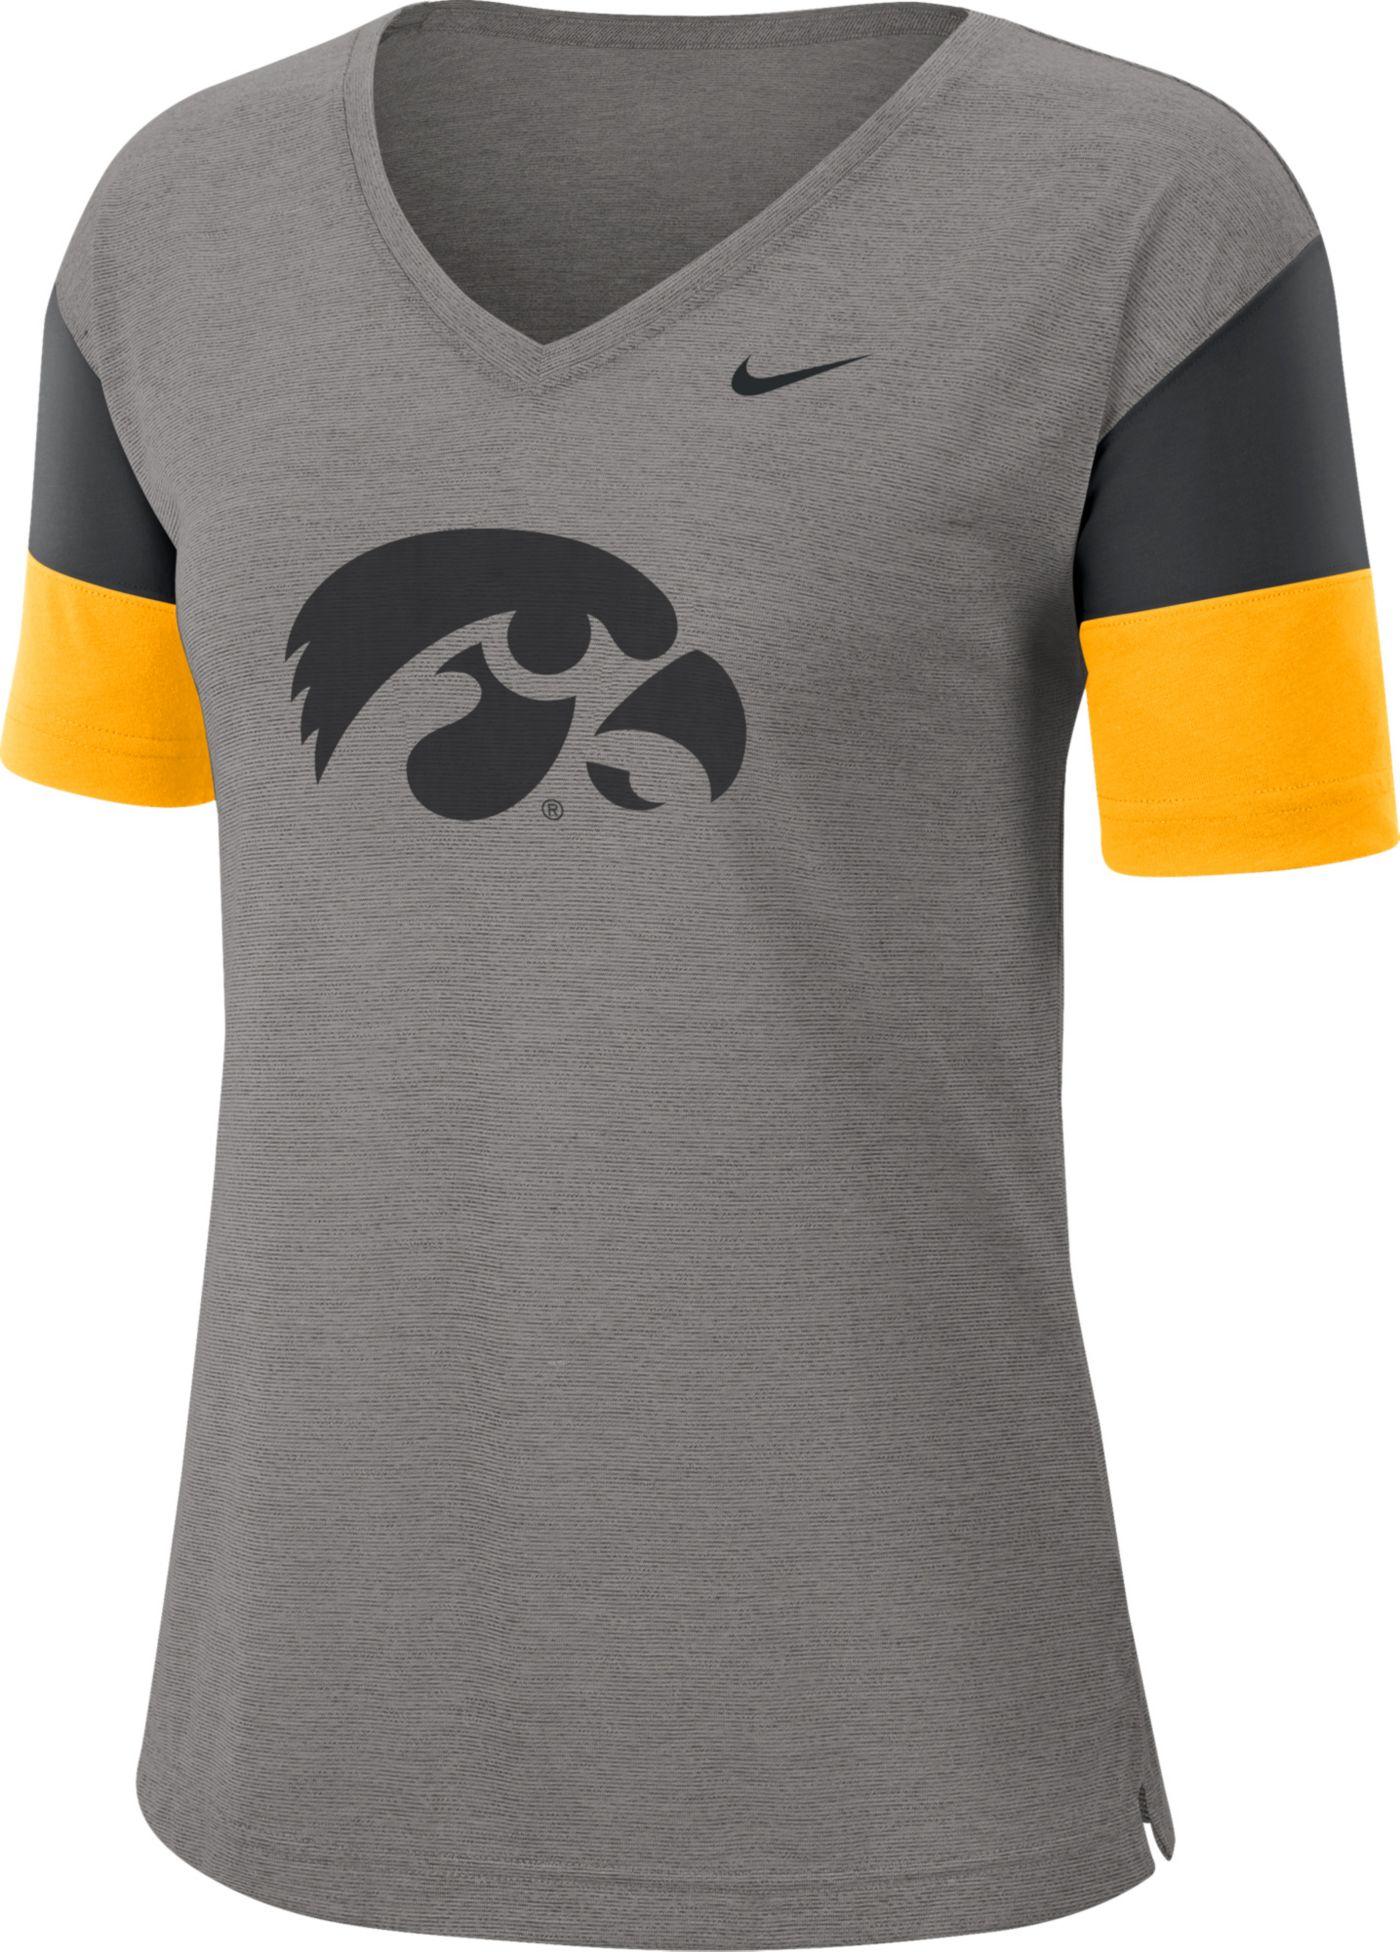 Nike Women's Iowa Hawkeyes Grey Breathe V-Neck T-Shirt